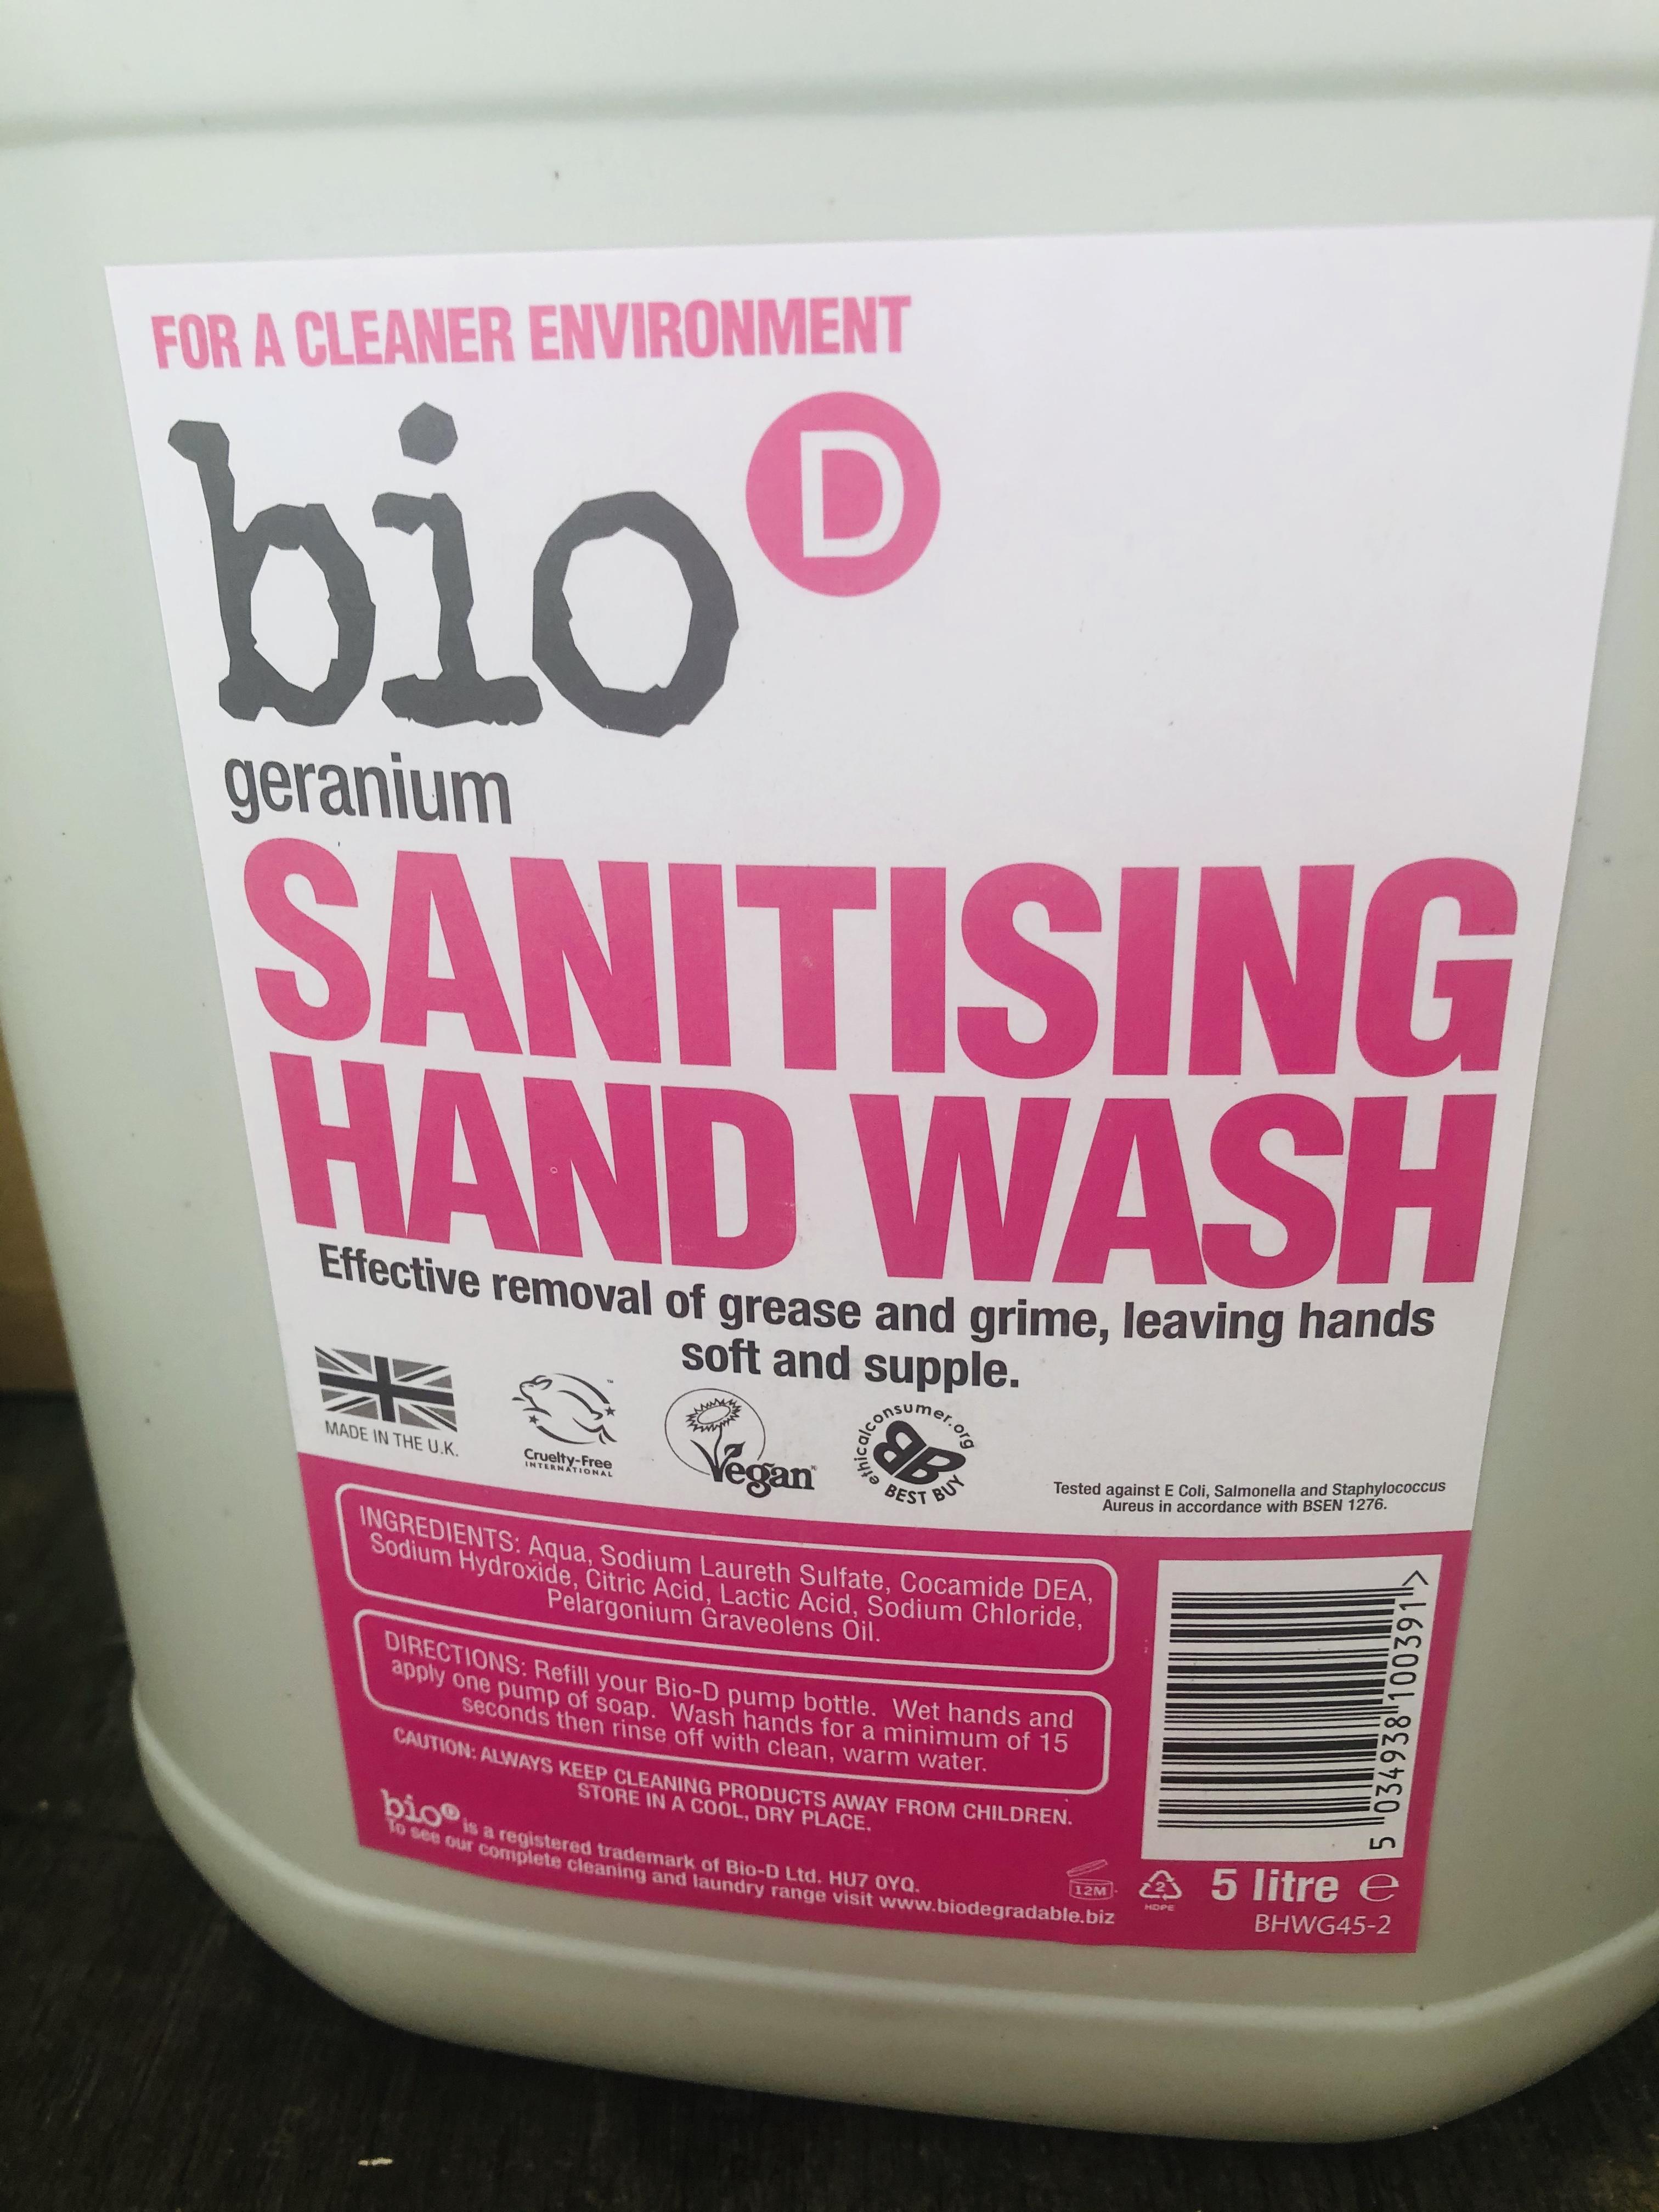 Sanitising Hand Wash (BioD) Geranium/Lime & Aloe Vera